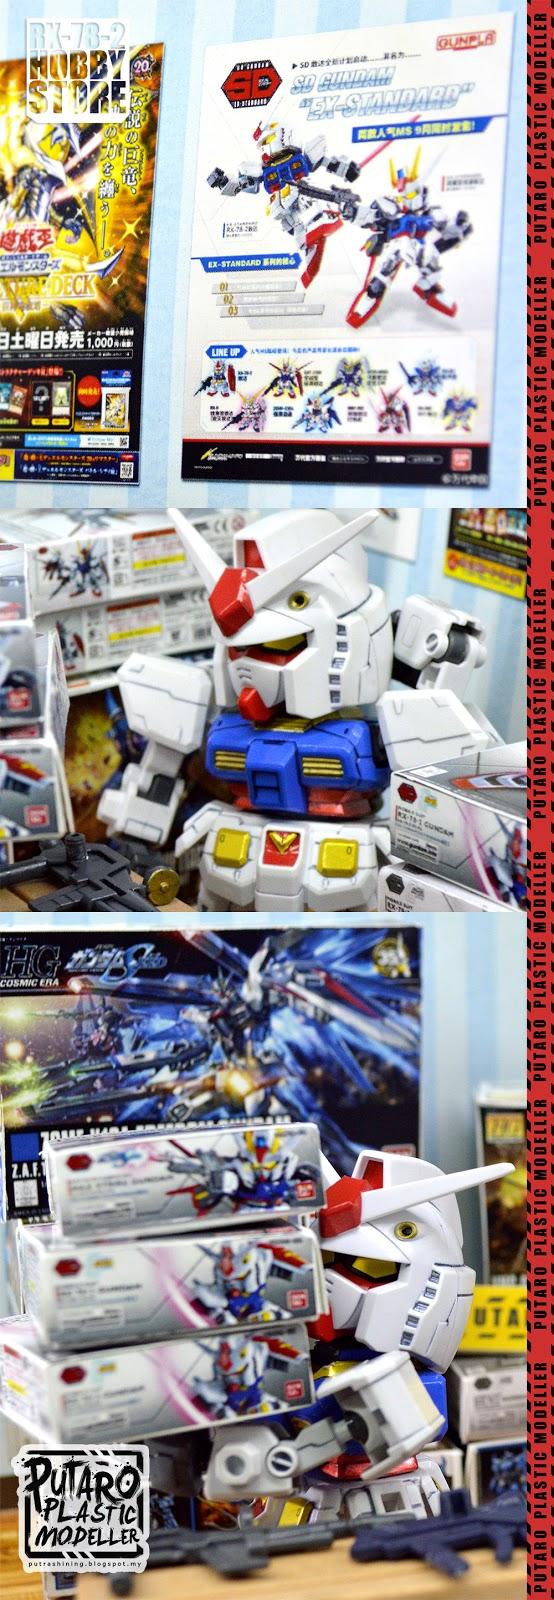 "SD Gundam EX-Standard RX-78-2 custom ""RX-78-2 Hobby Store"" by Putra Shining"